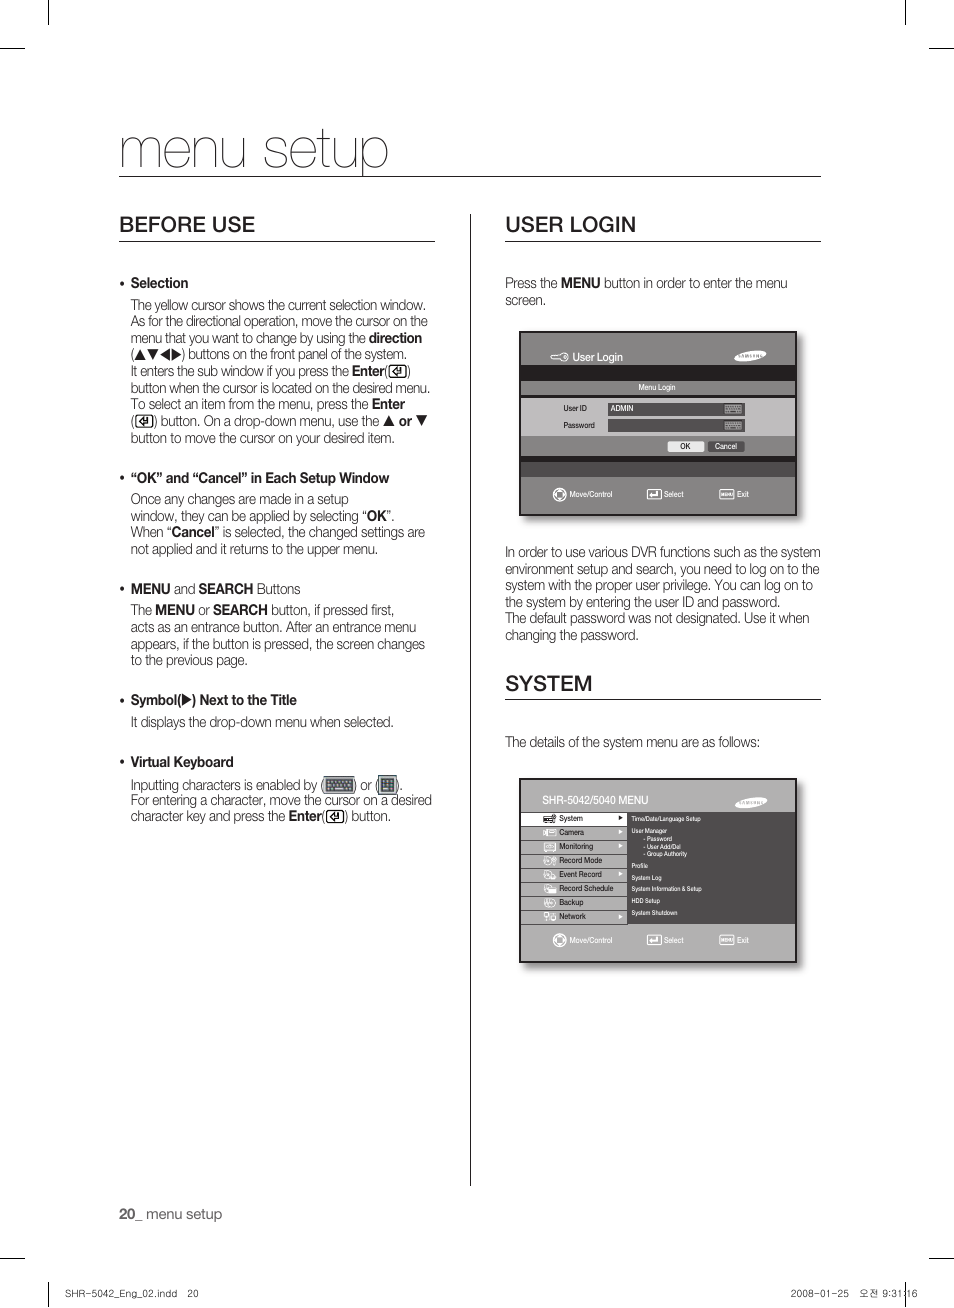 Menu setup, Before use, User login | Samsung SHR-5040 User